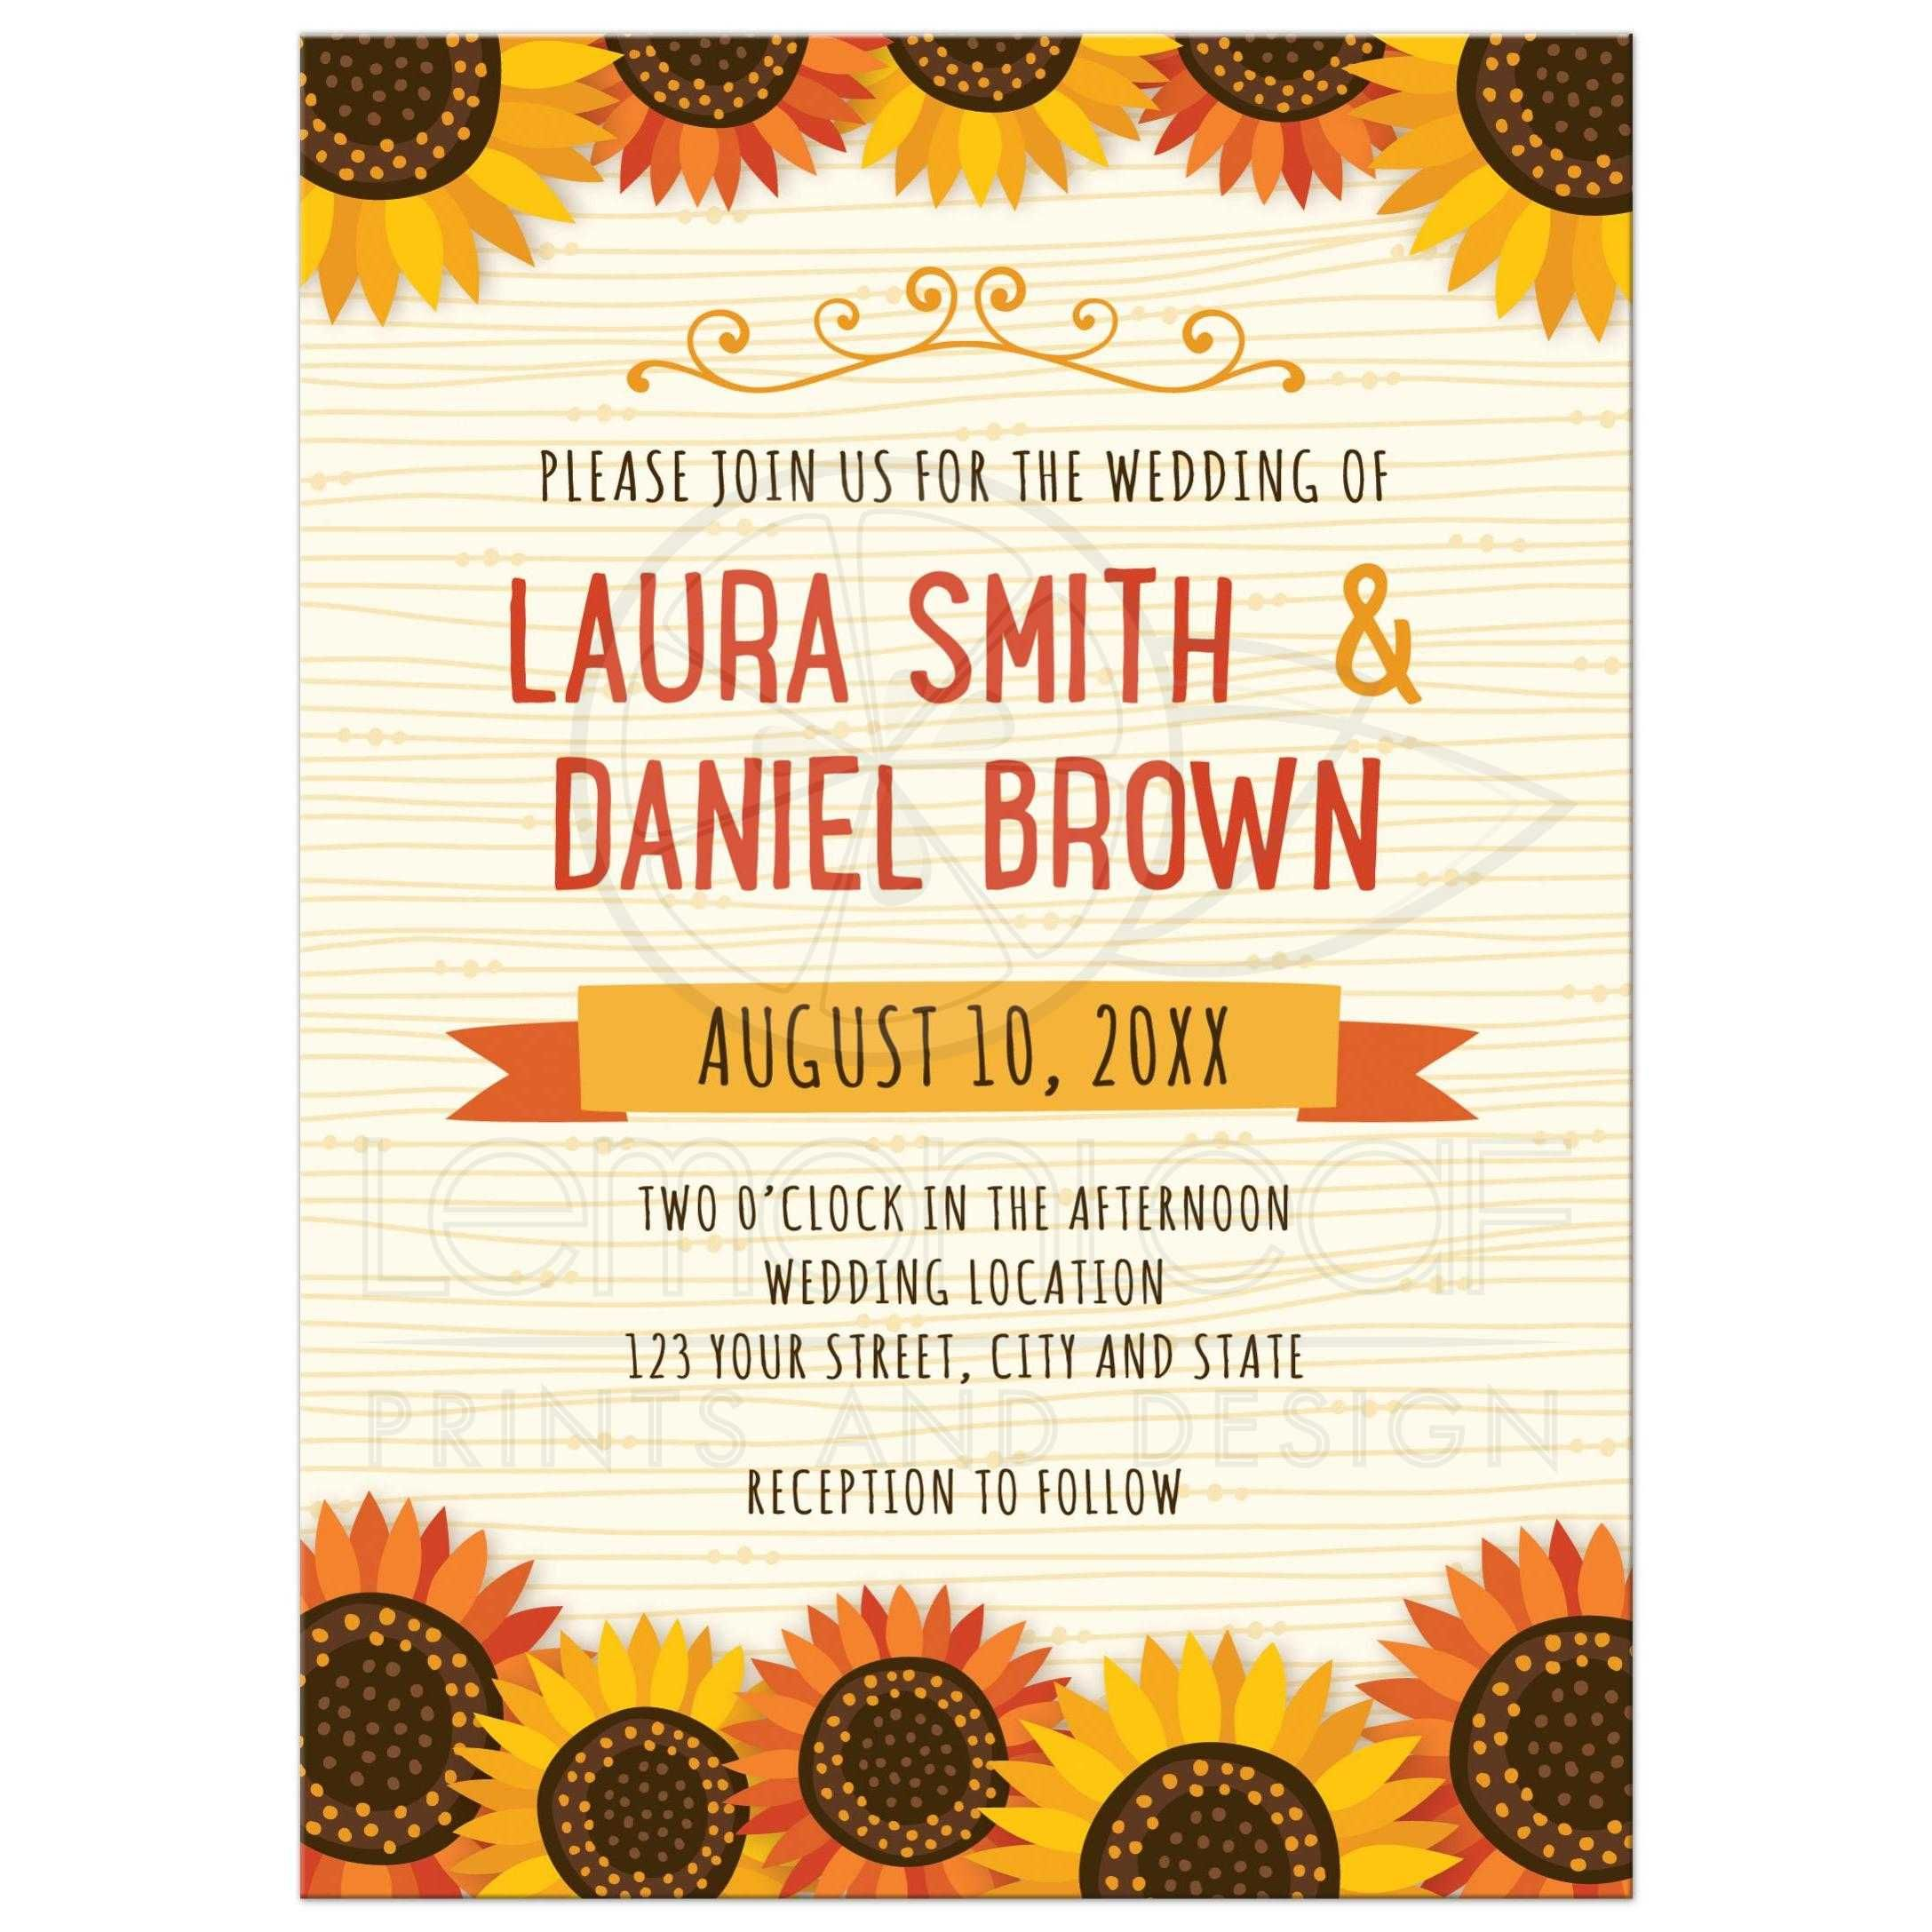 Cute Wedding Invite Wording: Whimsical Sunflowers On Wood Illustration Background